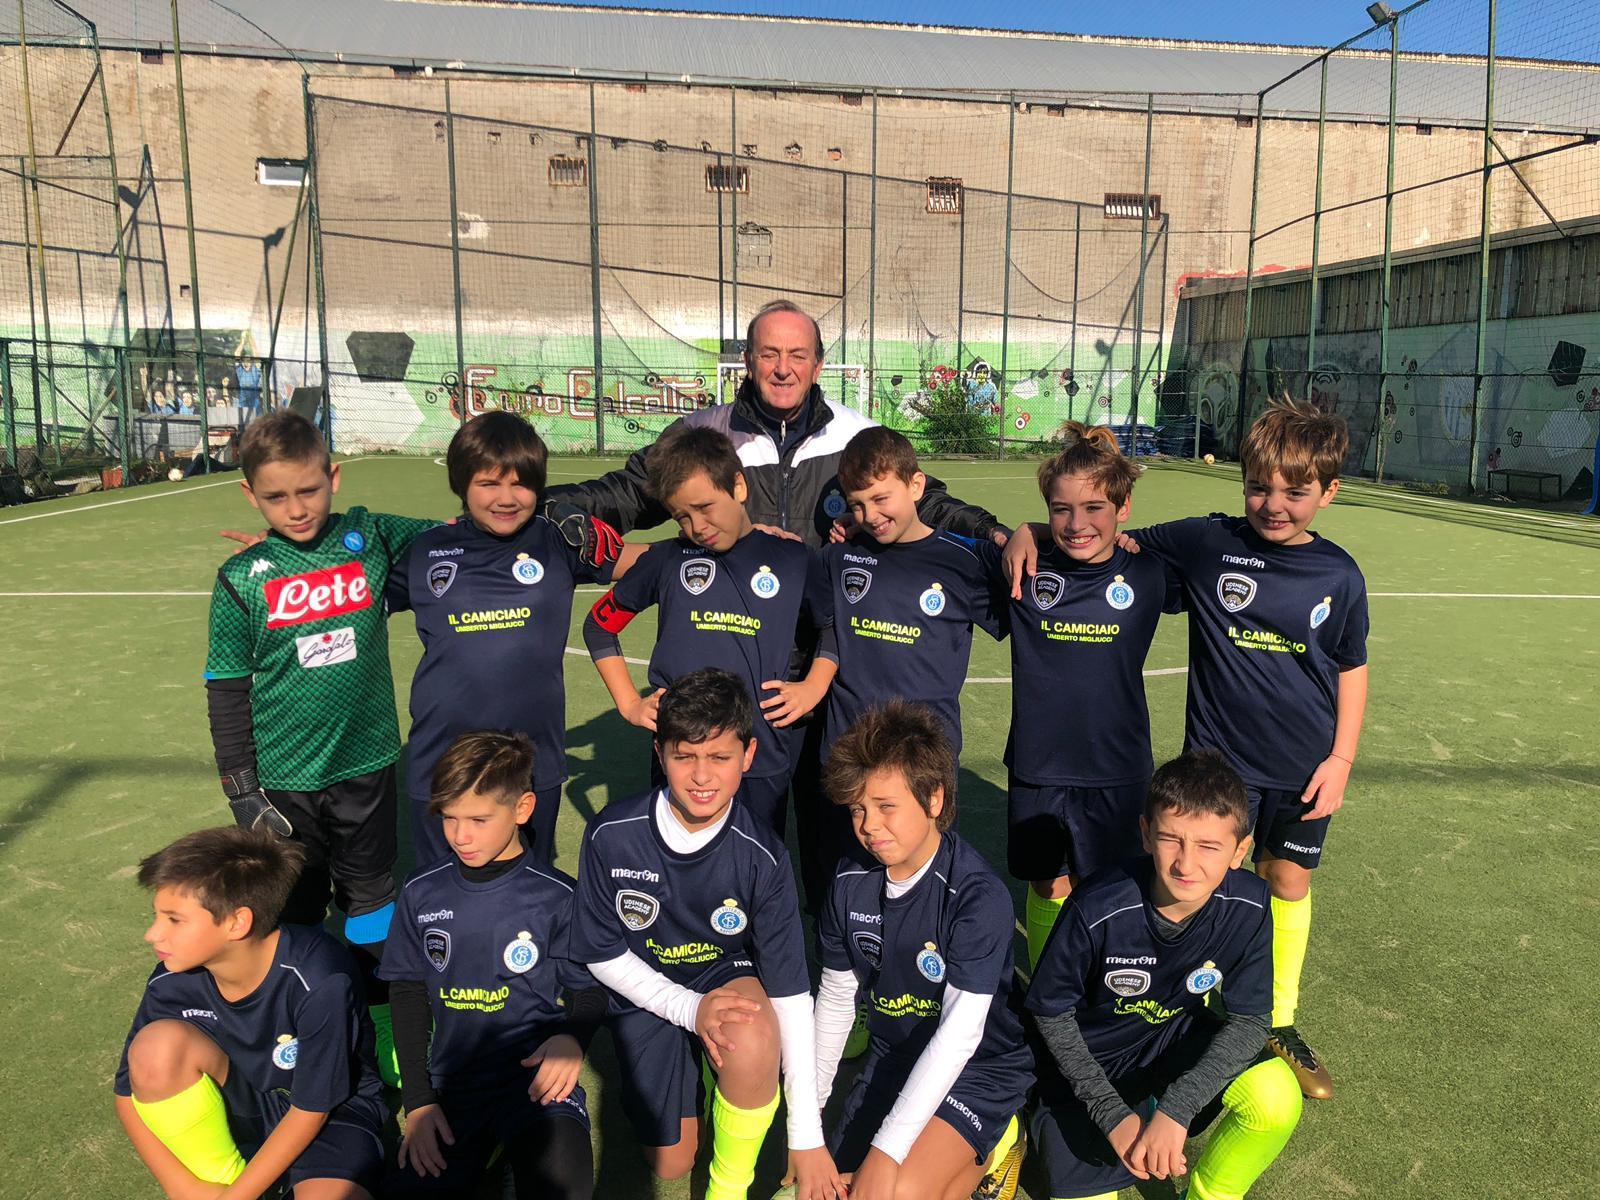 Leoncini 2009 Smedile Fc Napoli